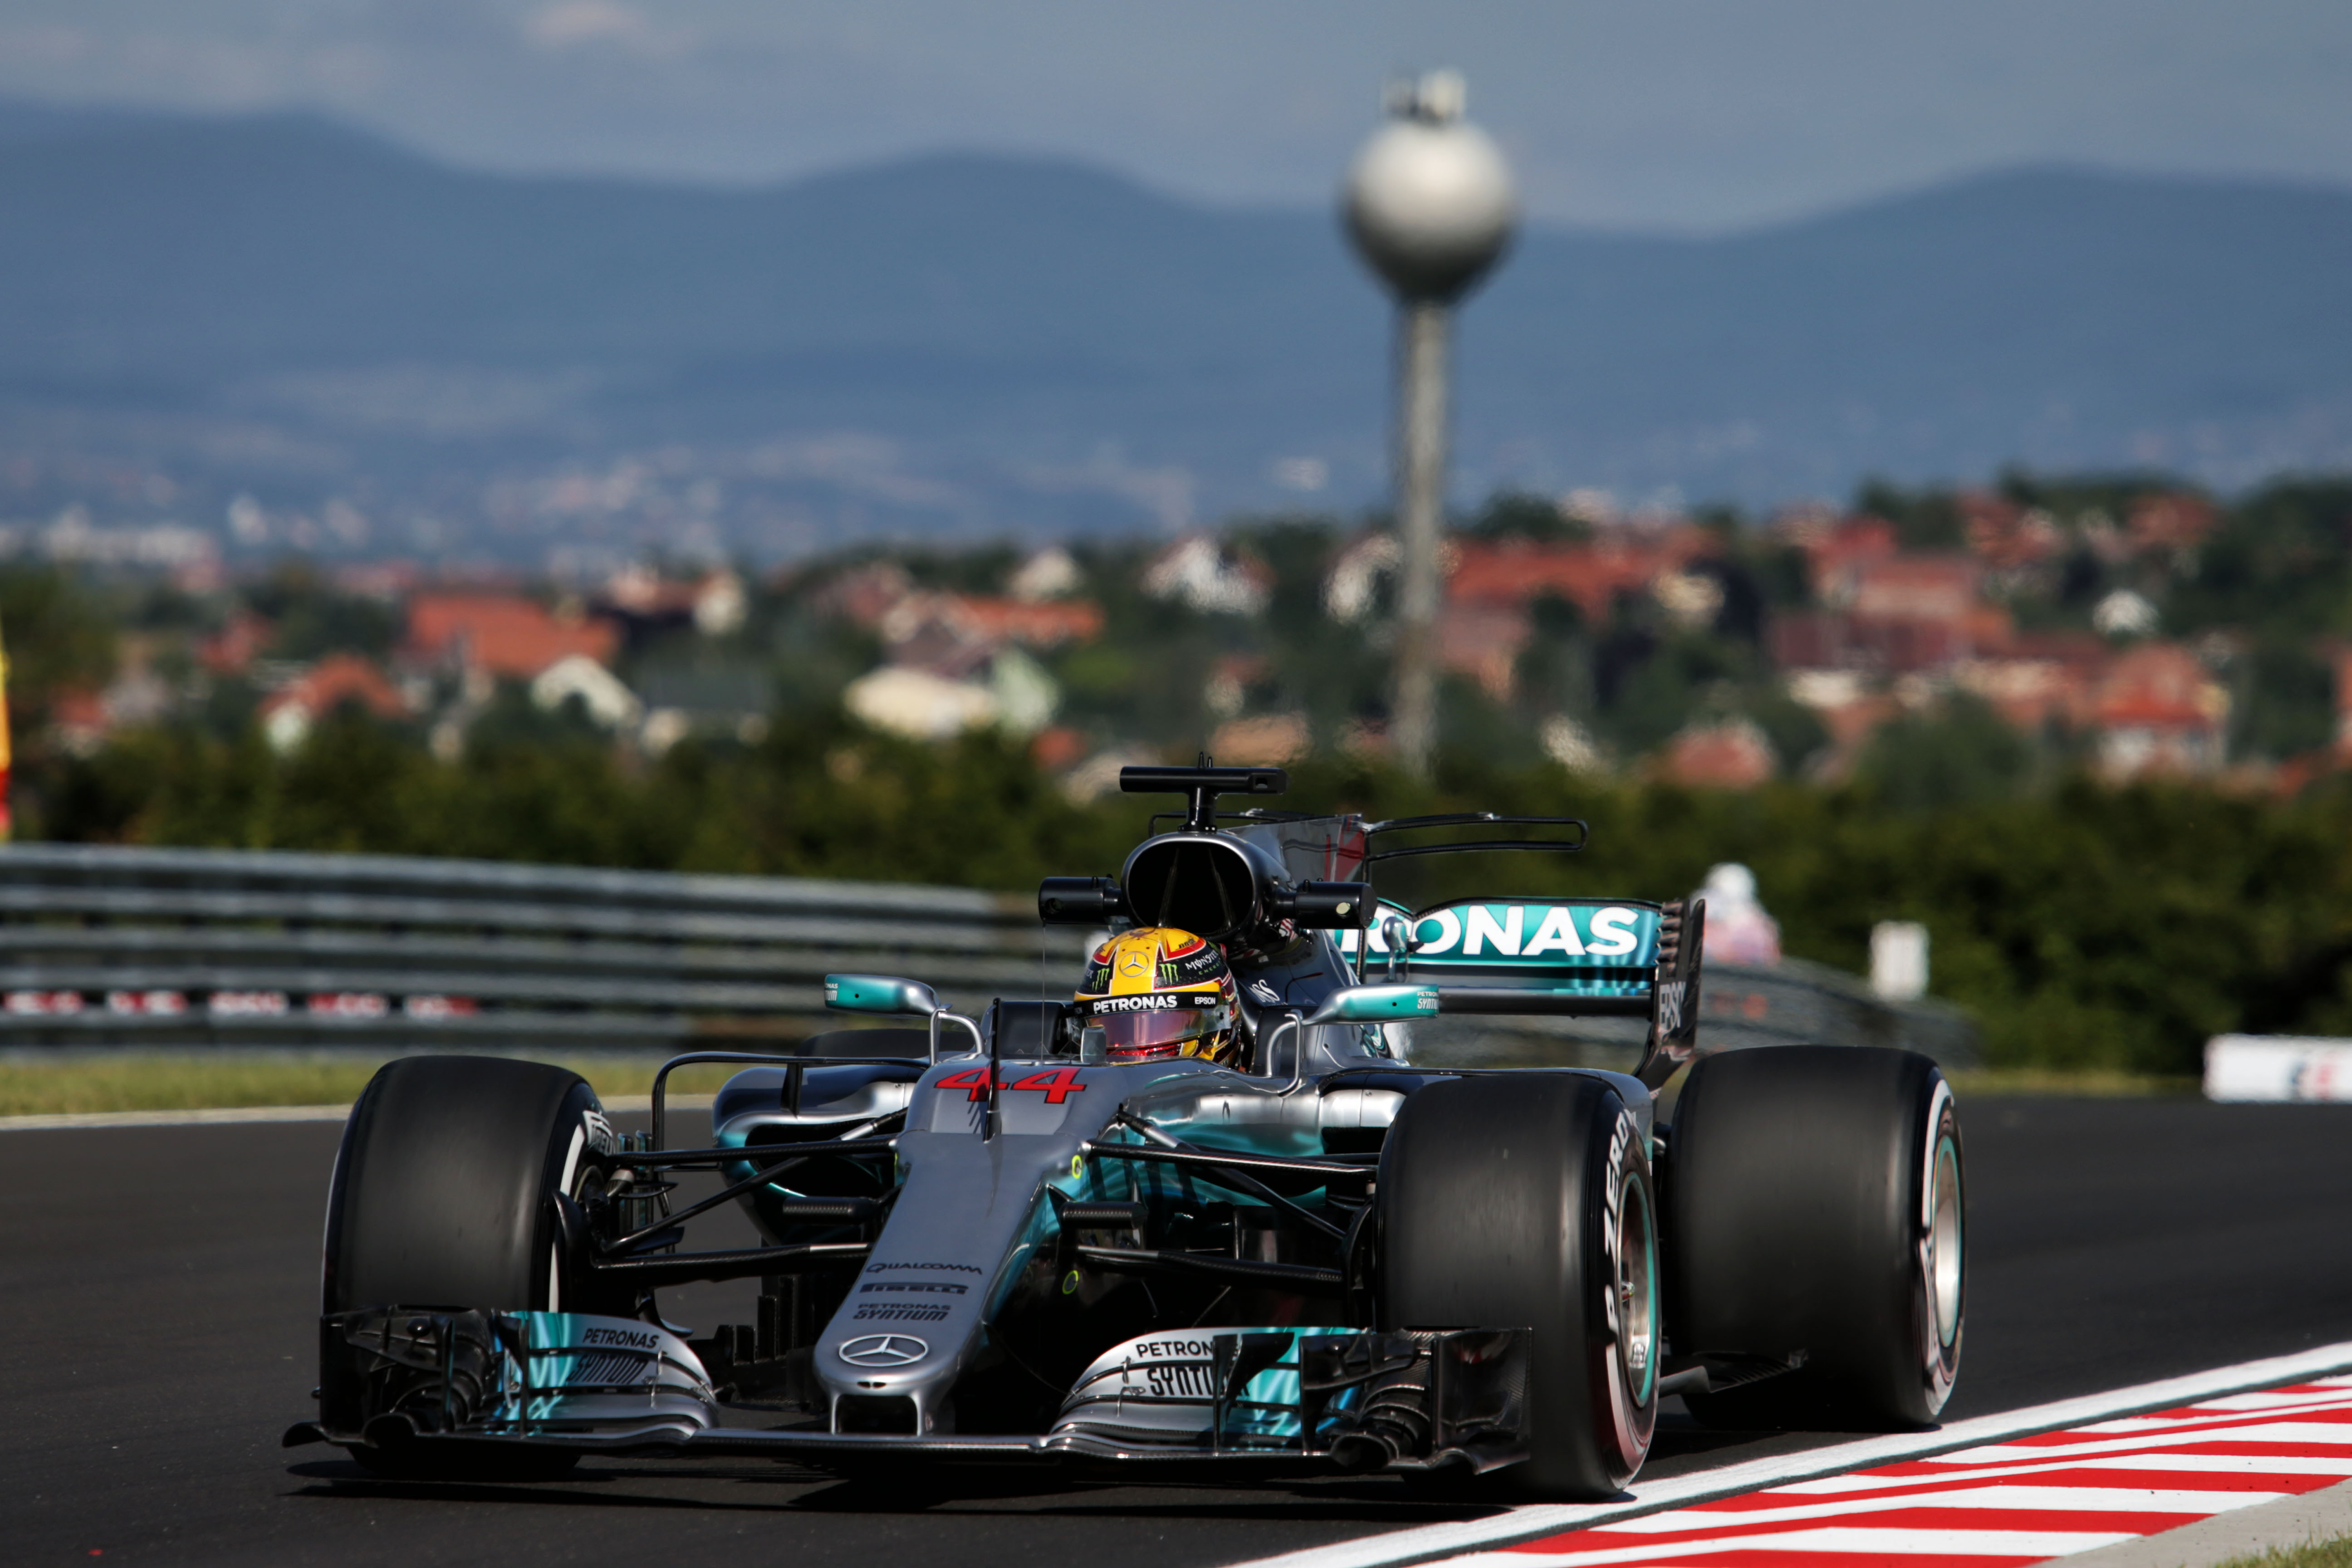 Mercedes amg petronas w08 wallpaper 7